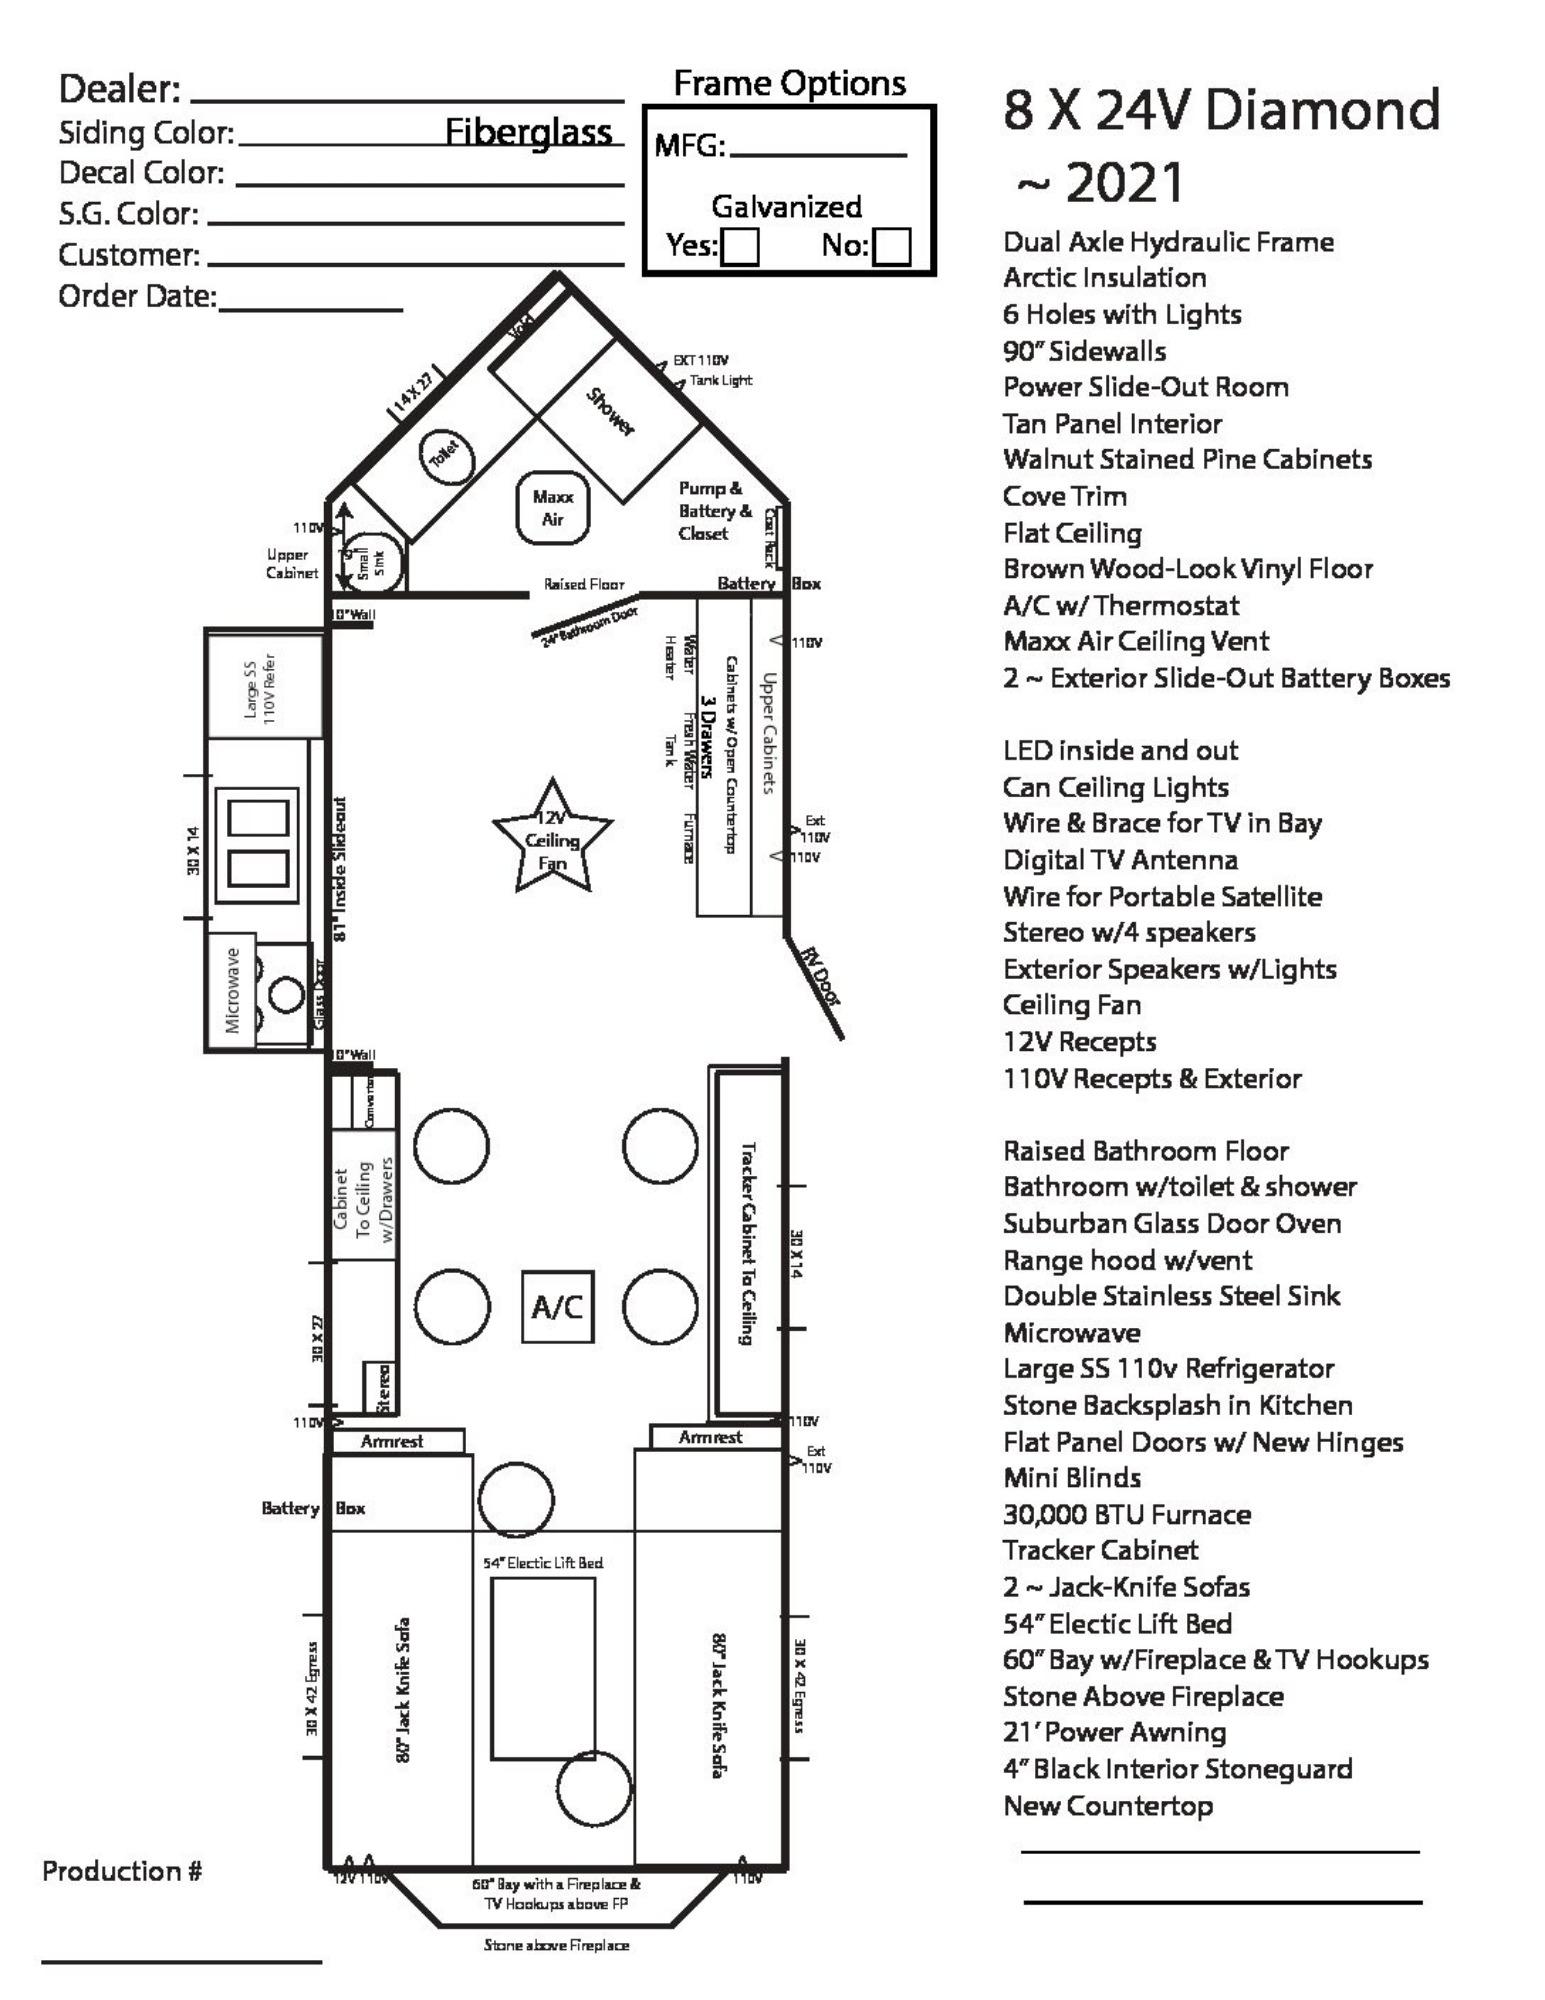 View Floor Plan for 2021 AMERICAN SURPLUS ICE CASTLE RV 8X24V DIAMOND